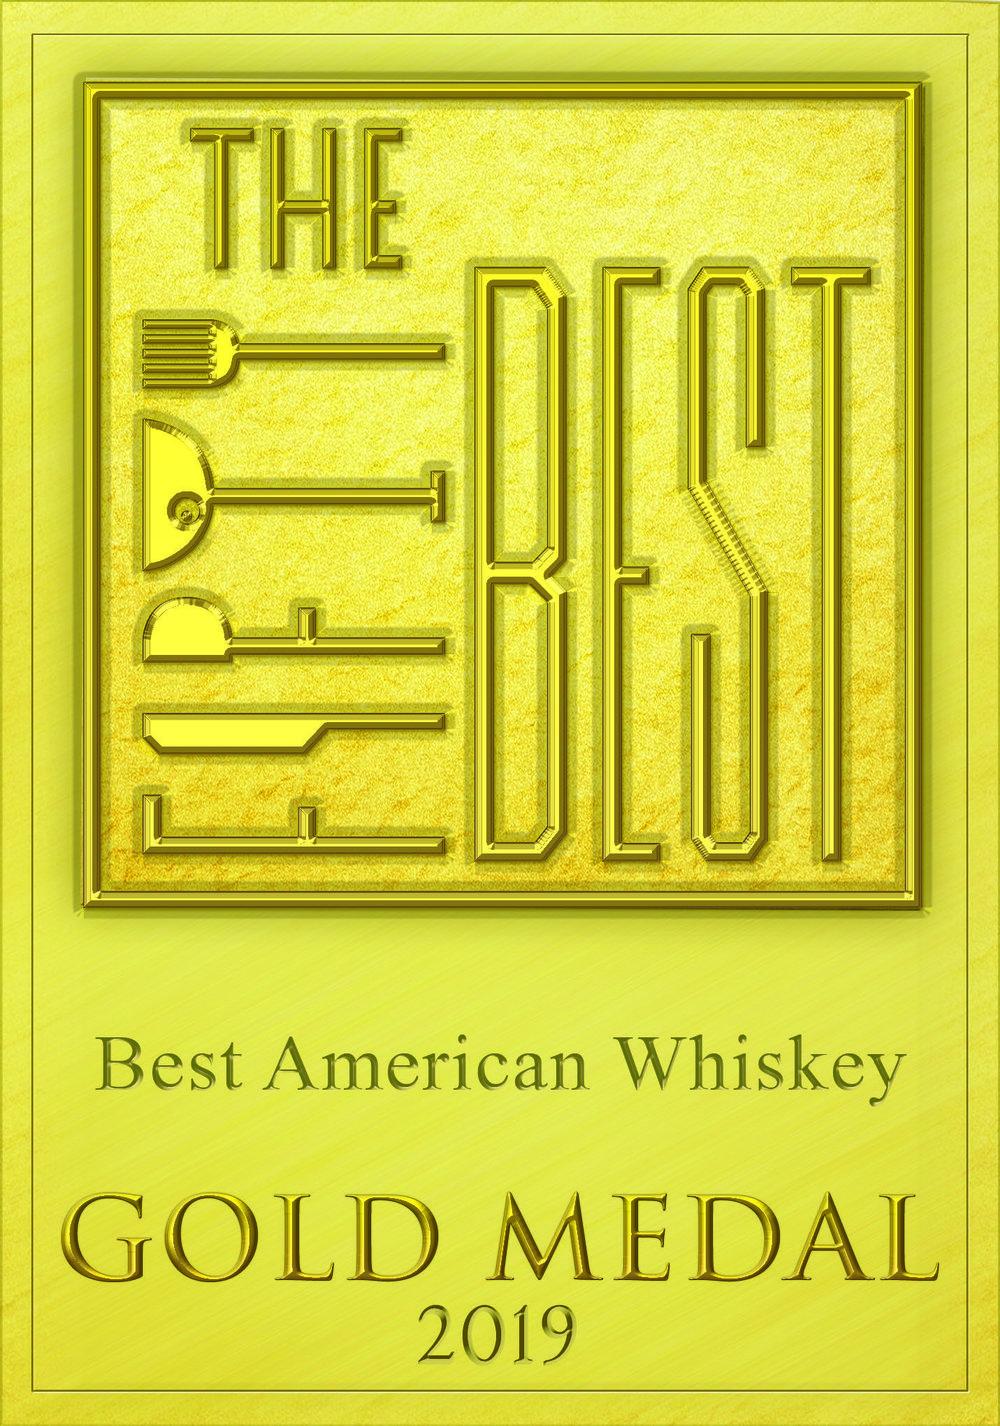 TheFiftyBest_AmericanWhiskey_GoldMedal_2019 copy.jpg